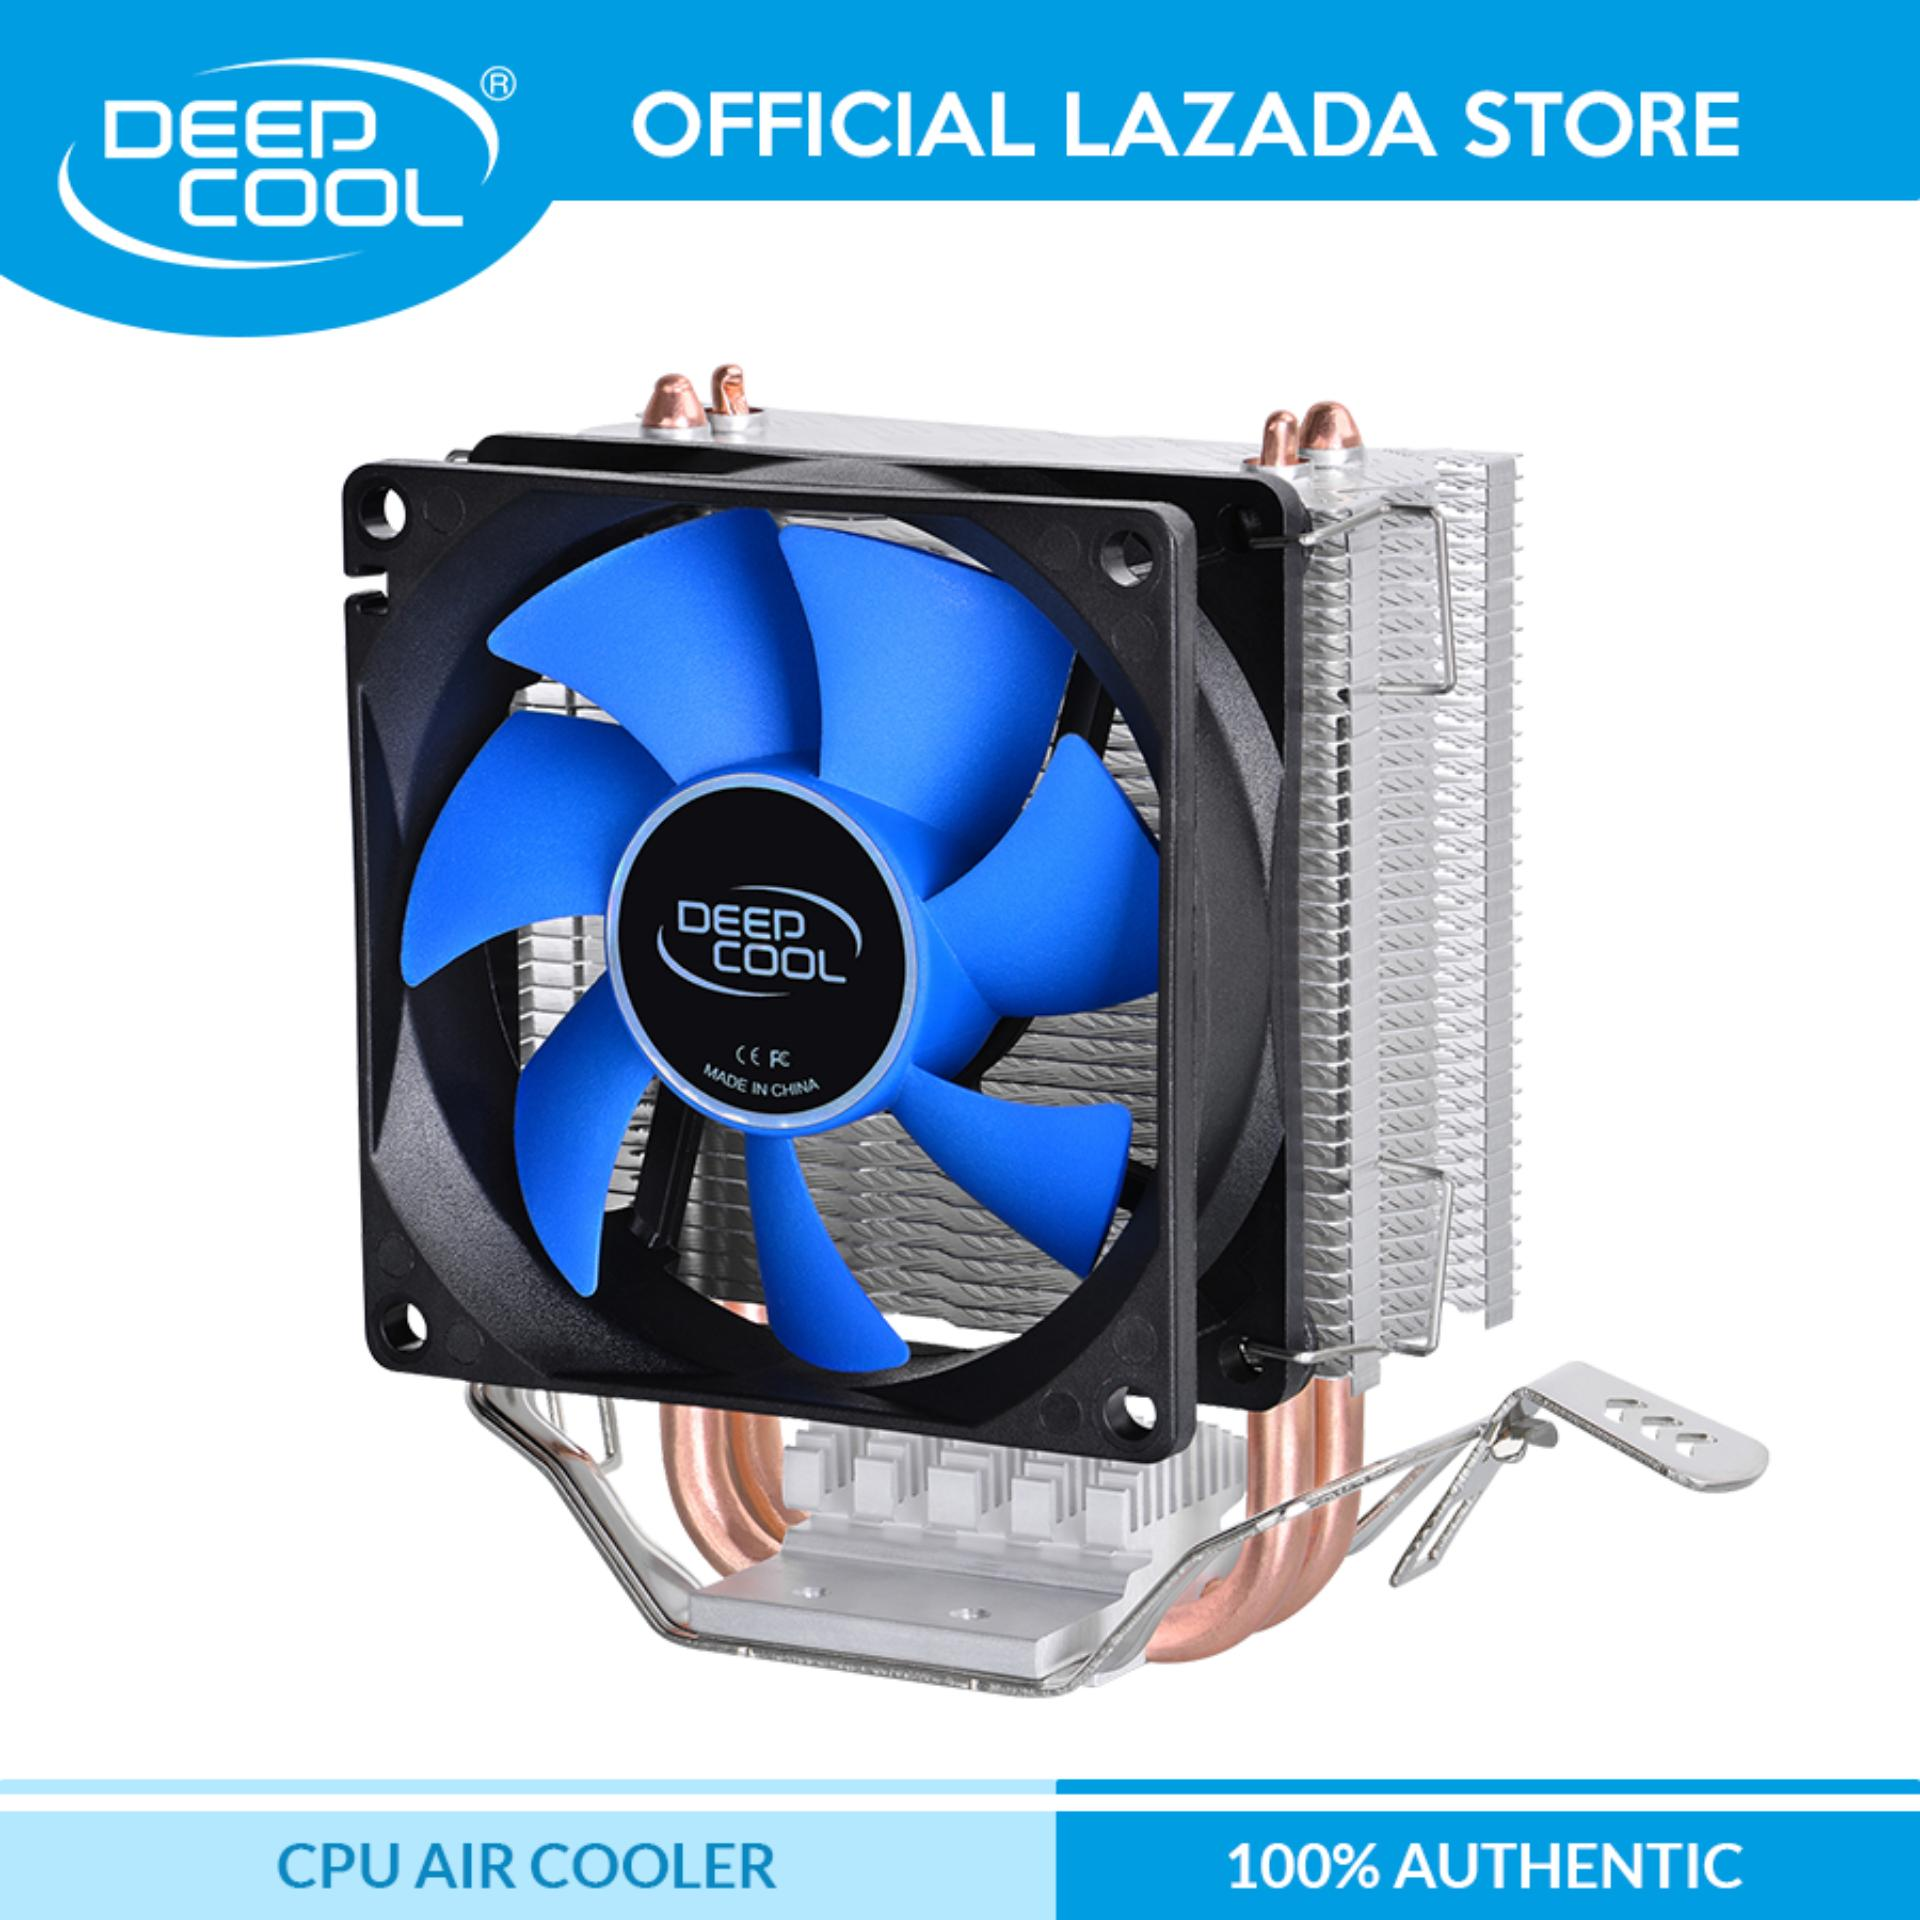 Deepcool ICEEDGE MINI FS V2 0 Heatsink Fan, Deep-cool CPU Cooler Best  seller for Intel and AMD Ryzen Series Processor for Intel Socket LGA